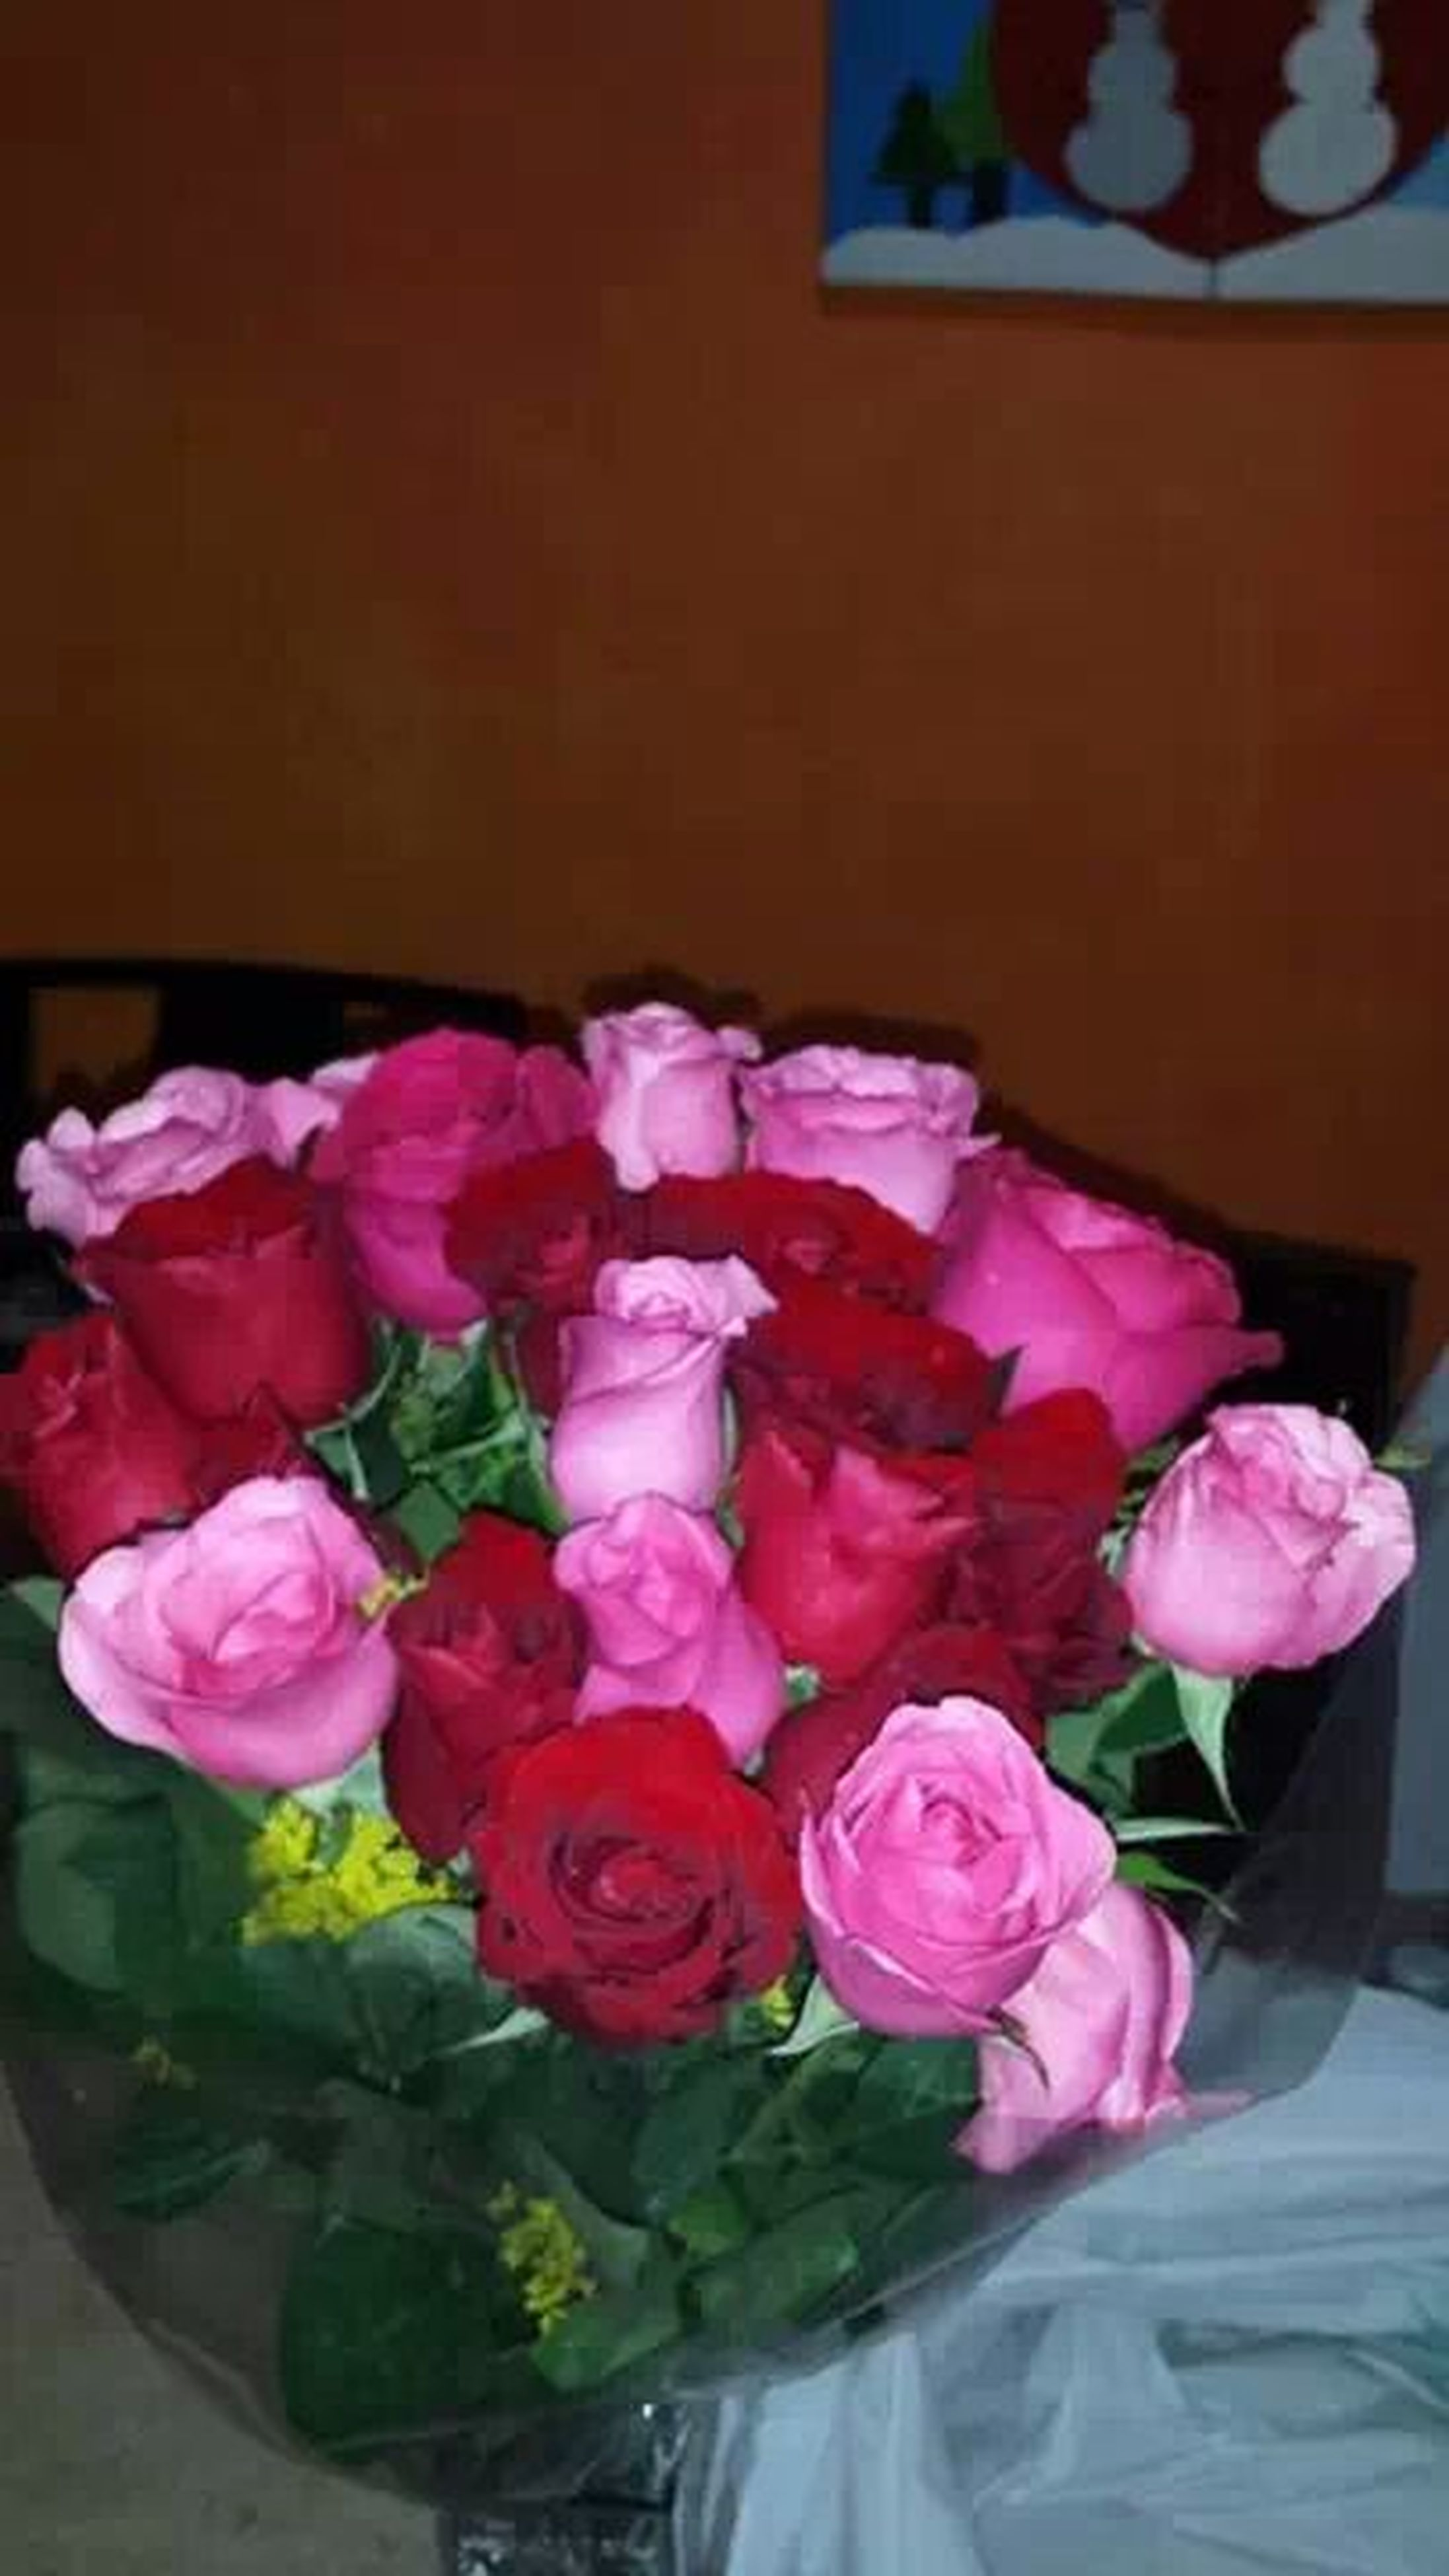 flower, freshness, fragility, indoors, petal, flower head, bouquet, vase, rose - flower, flower arrangement, beauty in nature, pink color, bunch of flowers, close-up, table, nature, tulip, variation, growth, plant